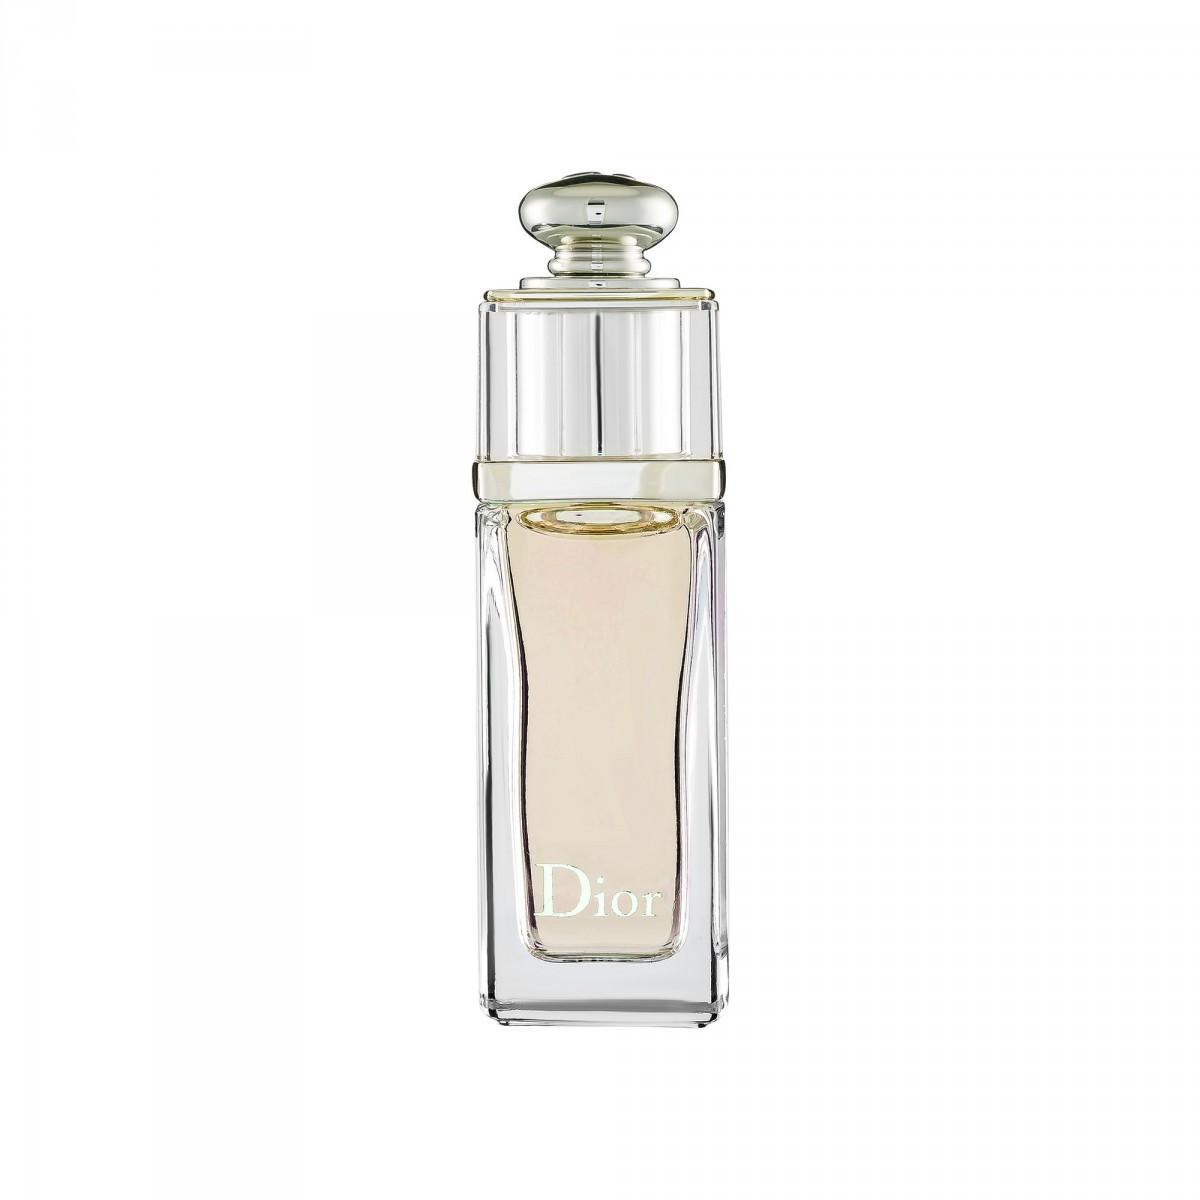 Dior Addict Perfume Set - Aelia Duty Free